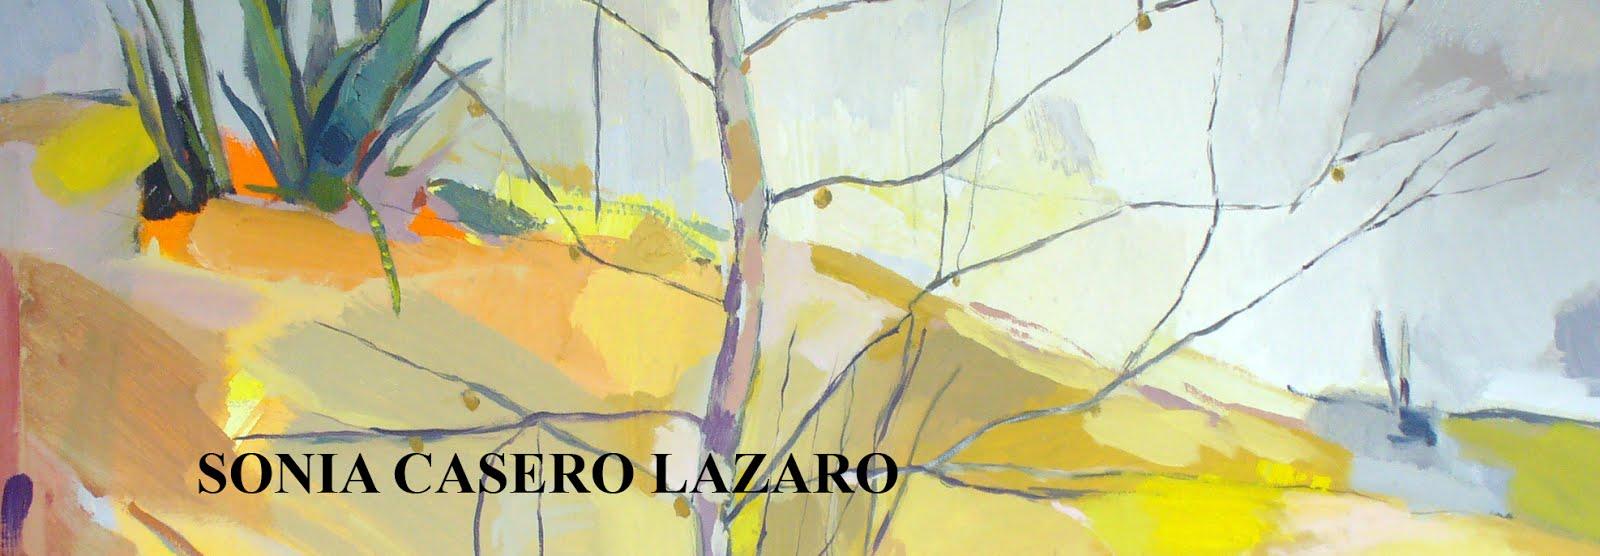 SONIA CASERO LAZARO